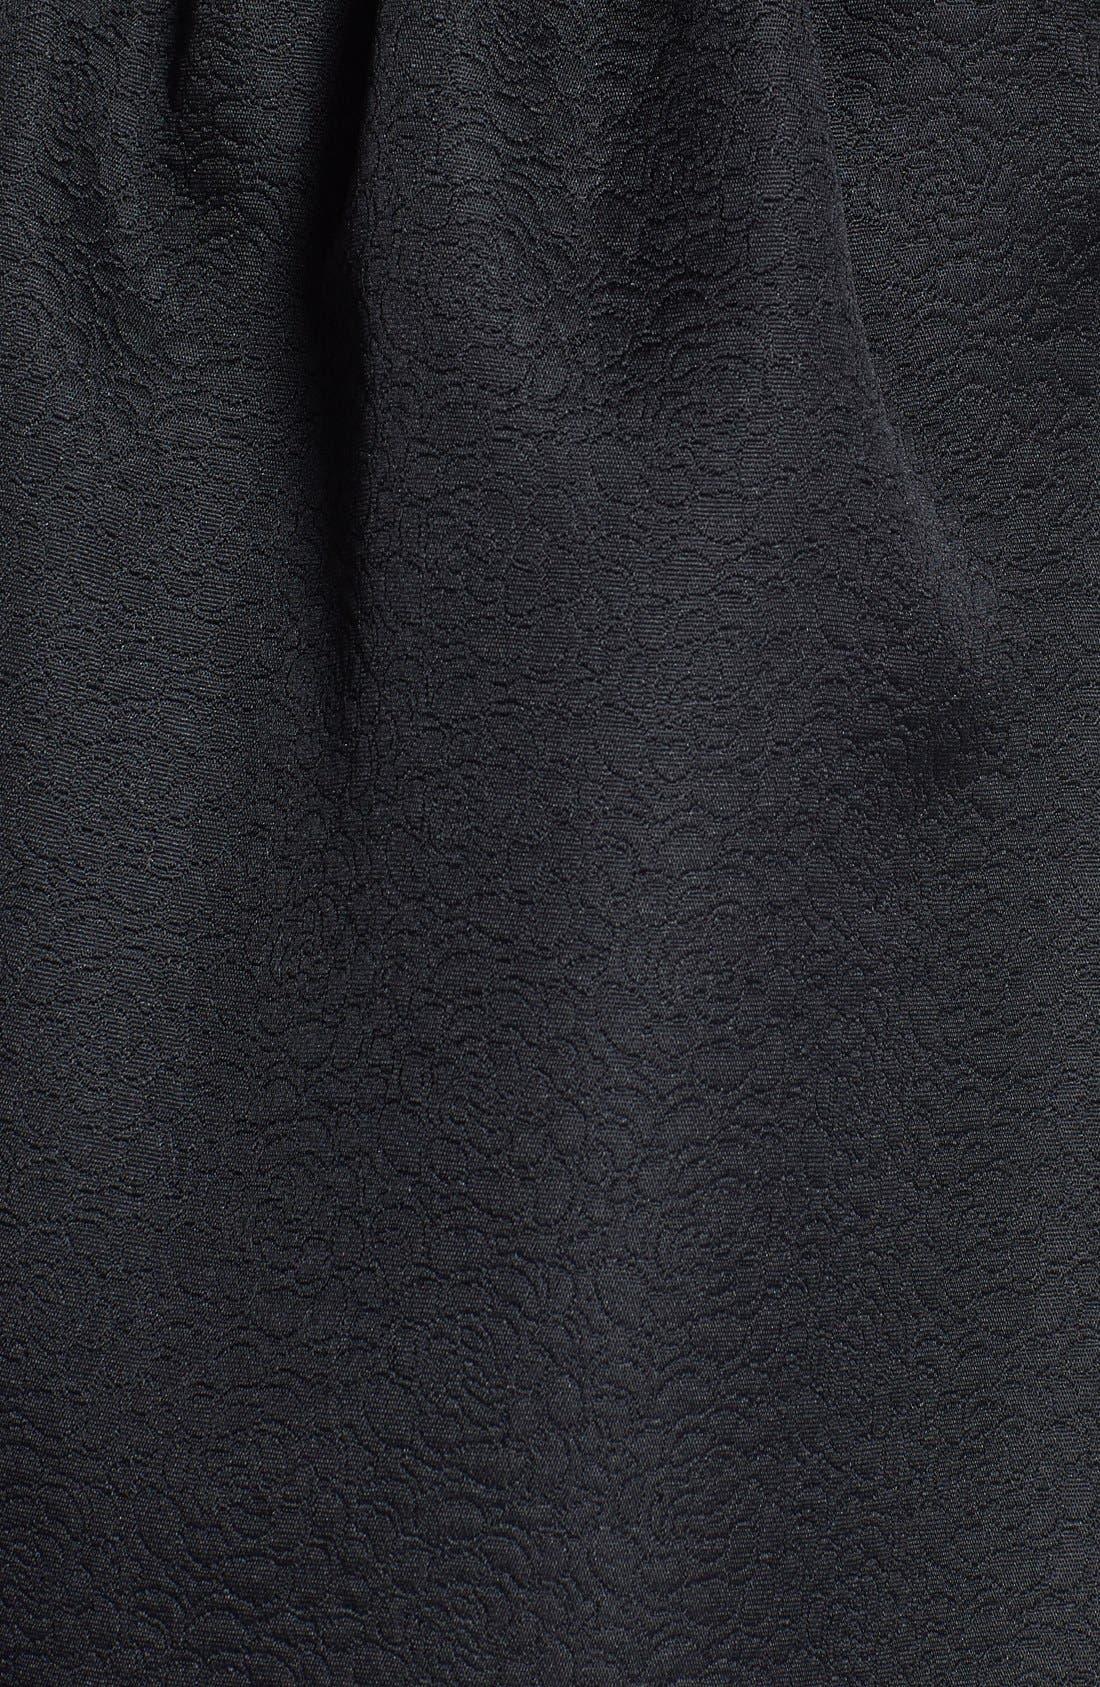 Alternate Image 3  - Everly Embossed Fit & Flare Dress (Juniors)